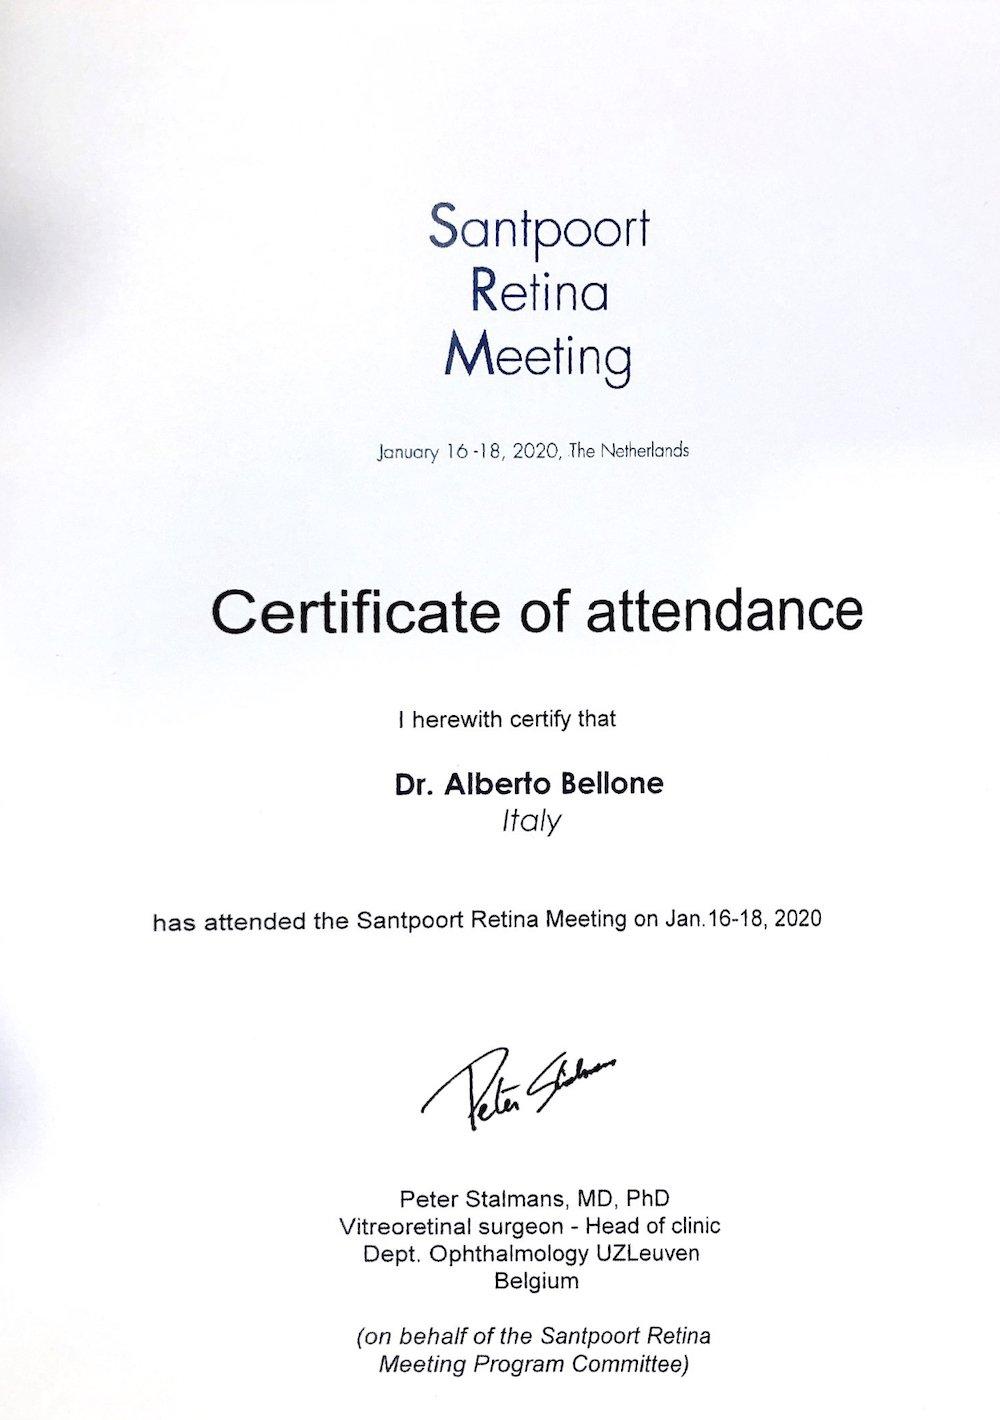 Santpoort Retina Meeting 2020